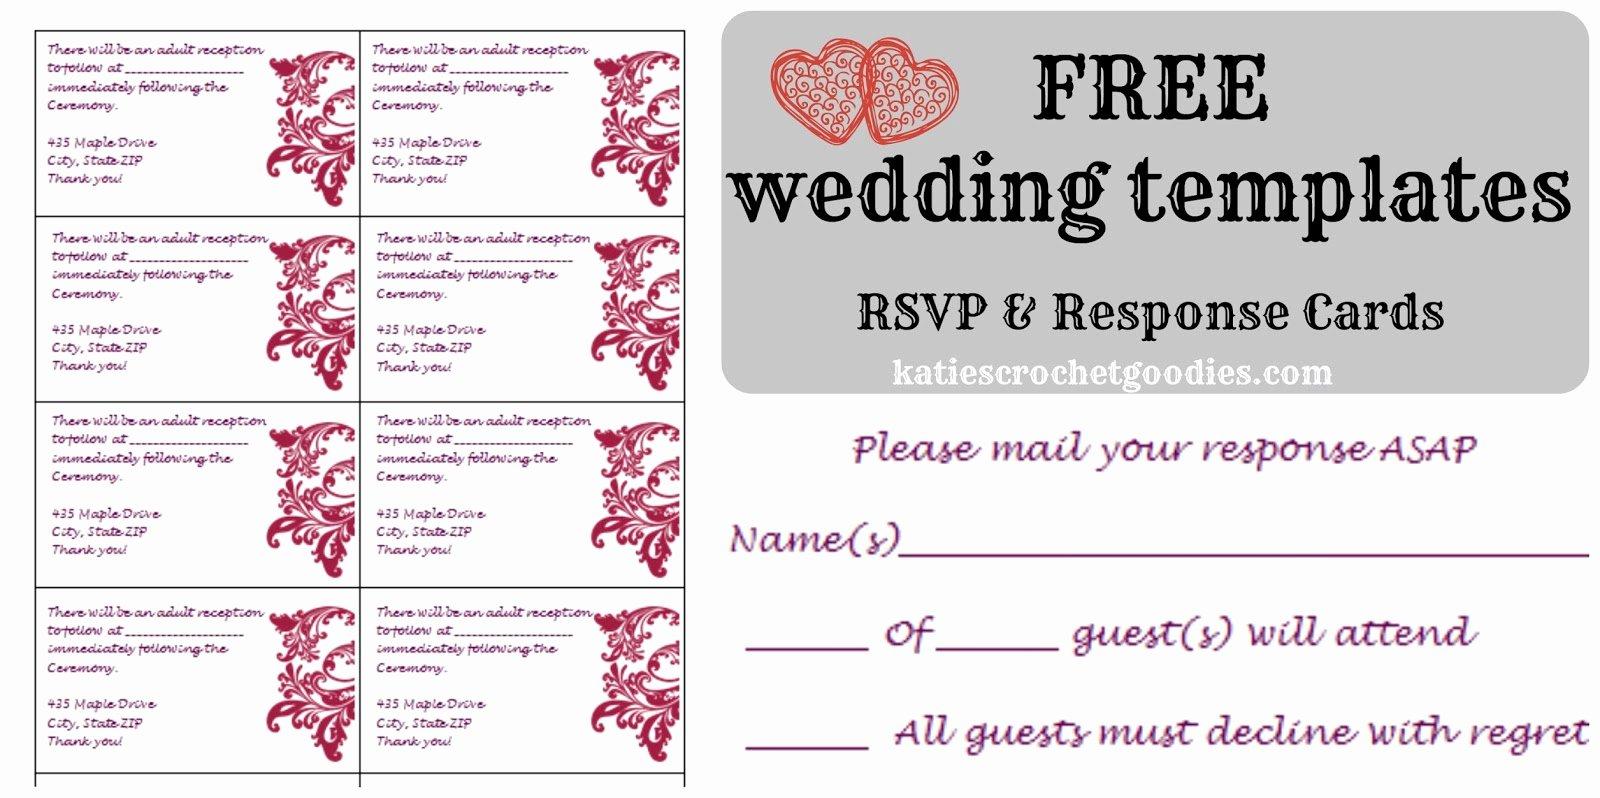 Free Wedding Templates Rsvp & Reception Cards Katie S